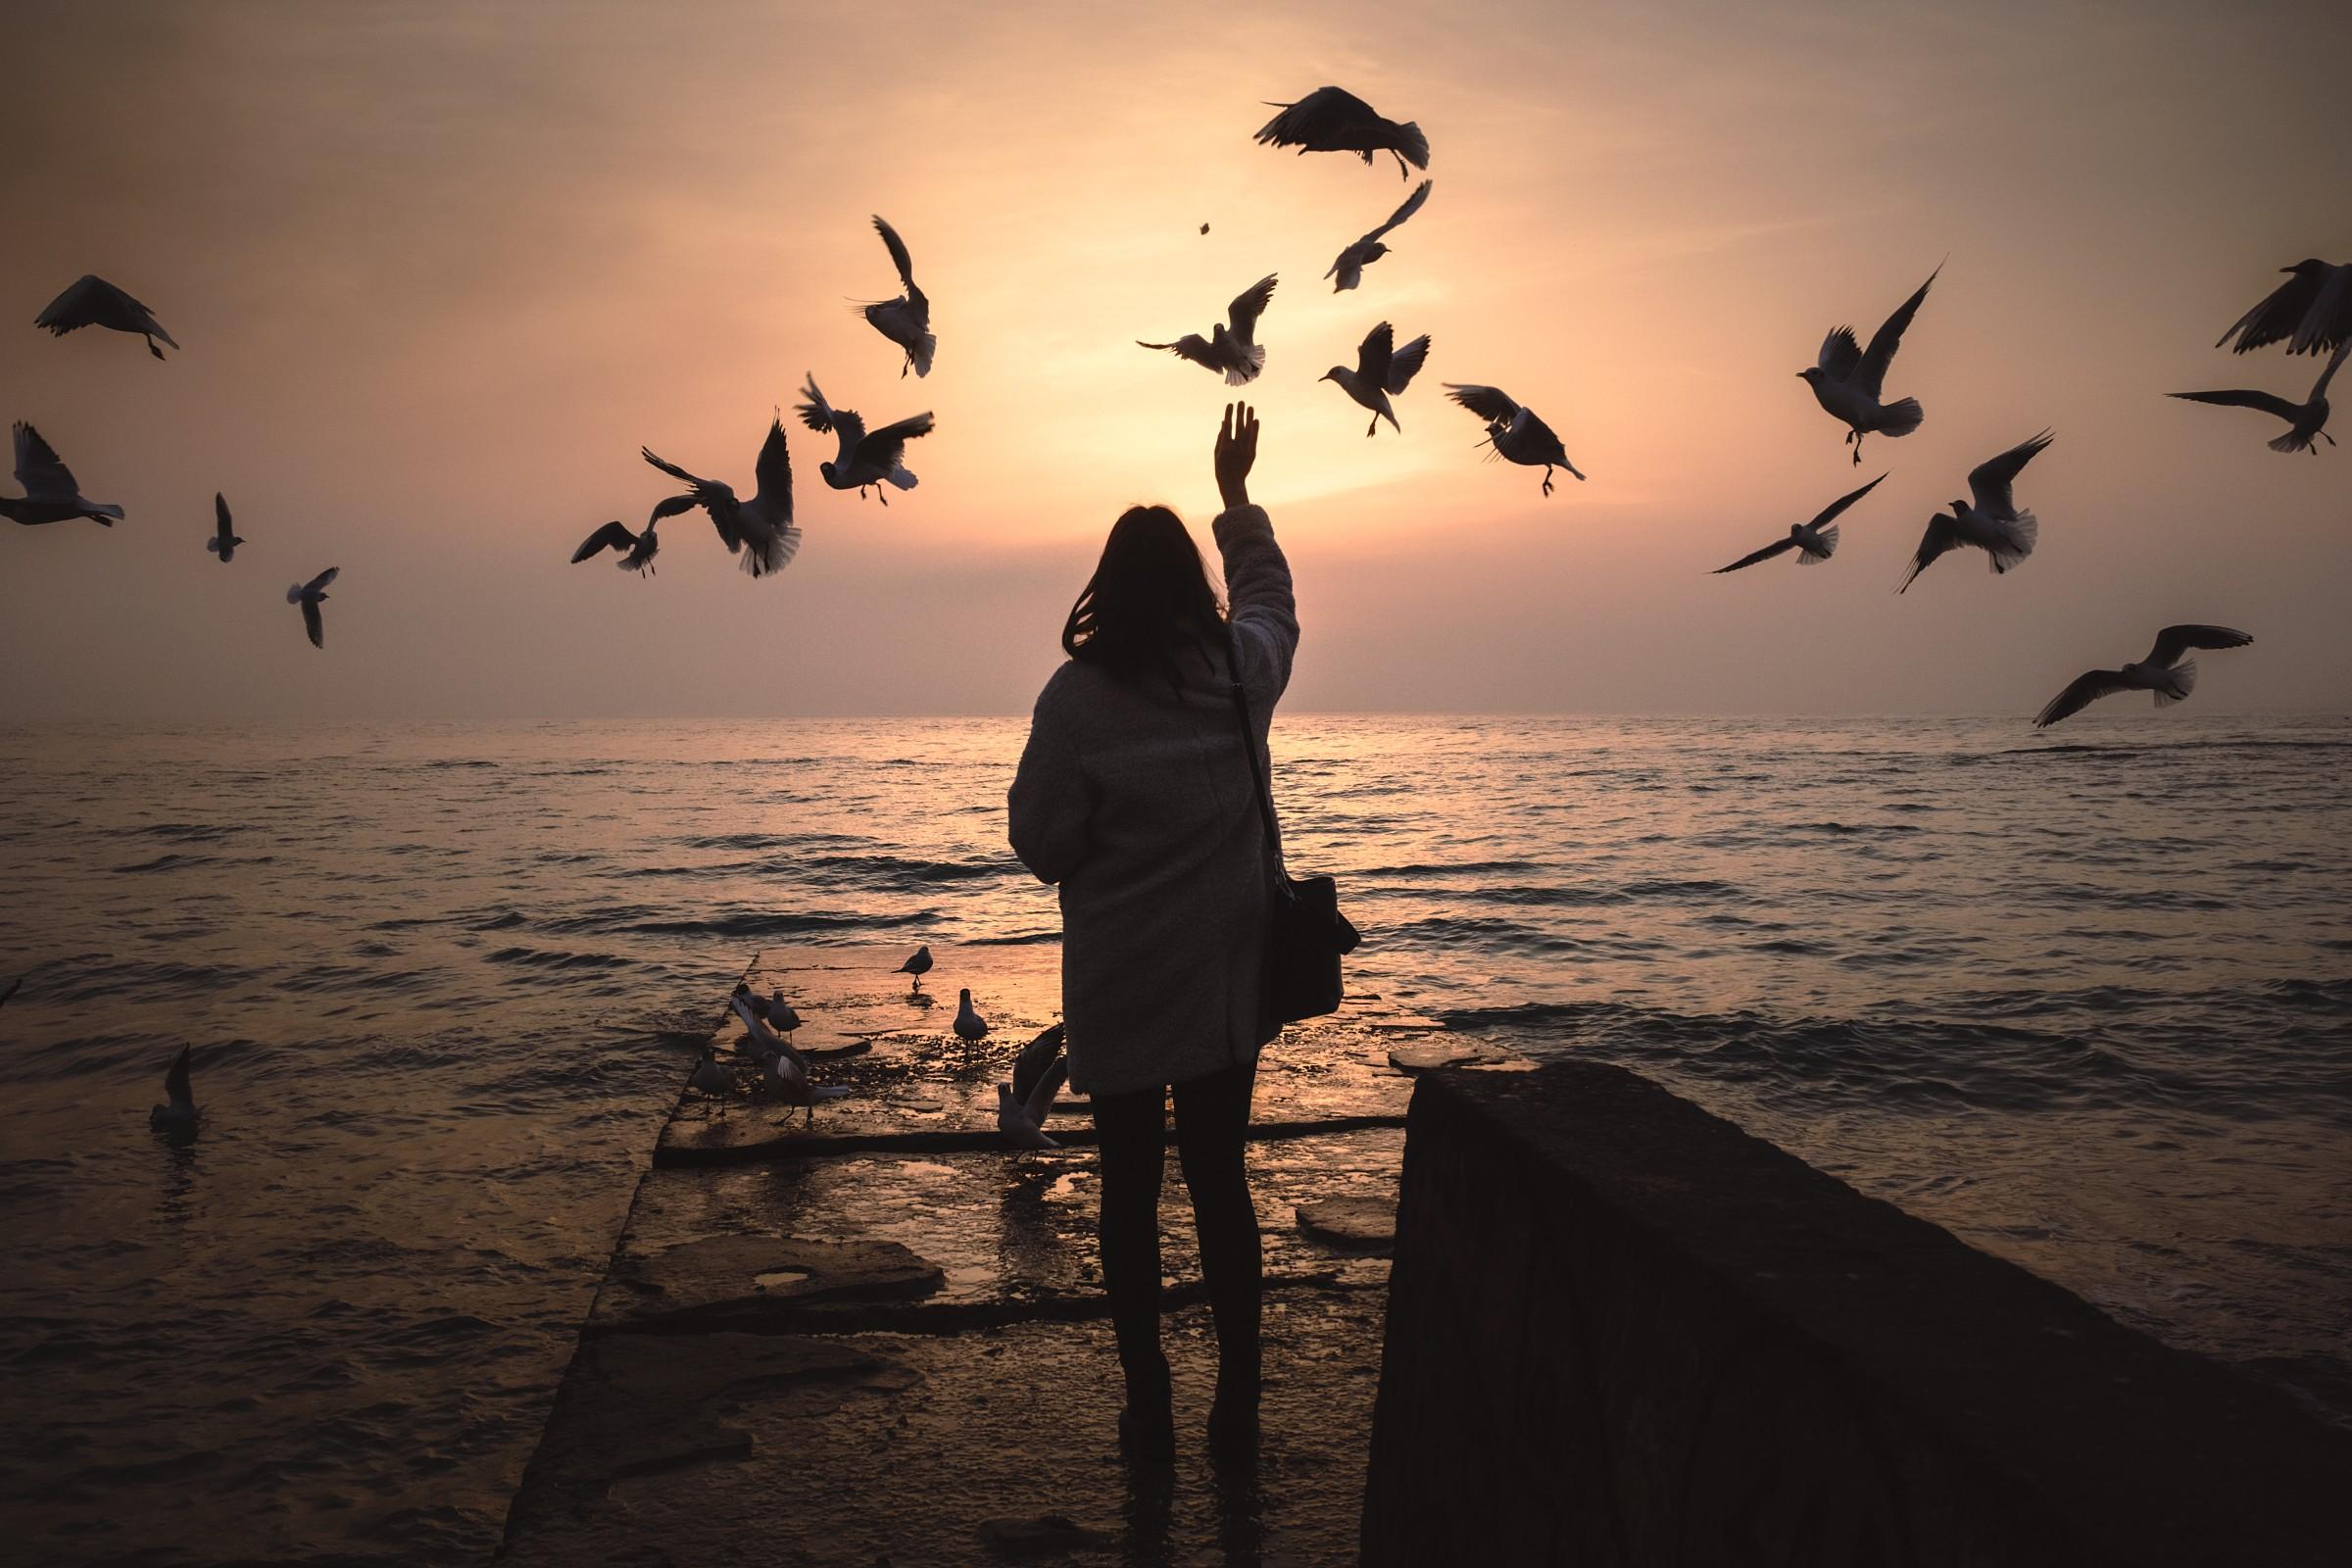 Marina is feeding seagulls at sunrise